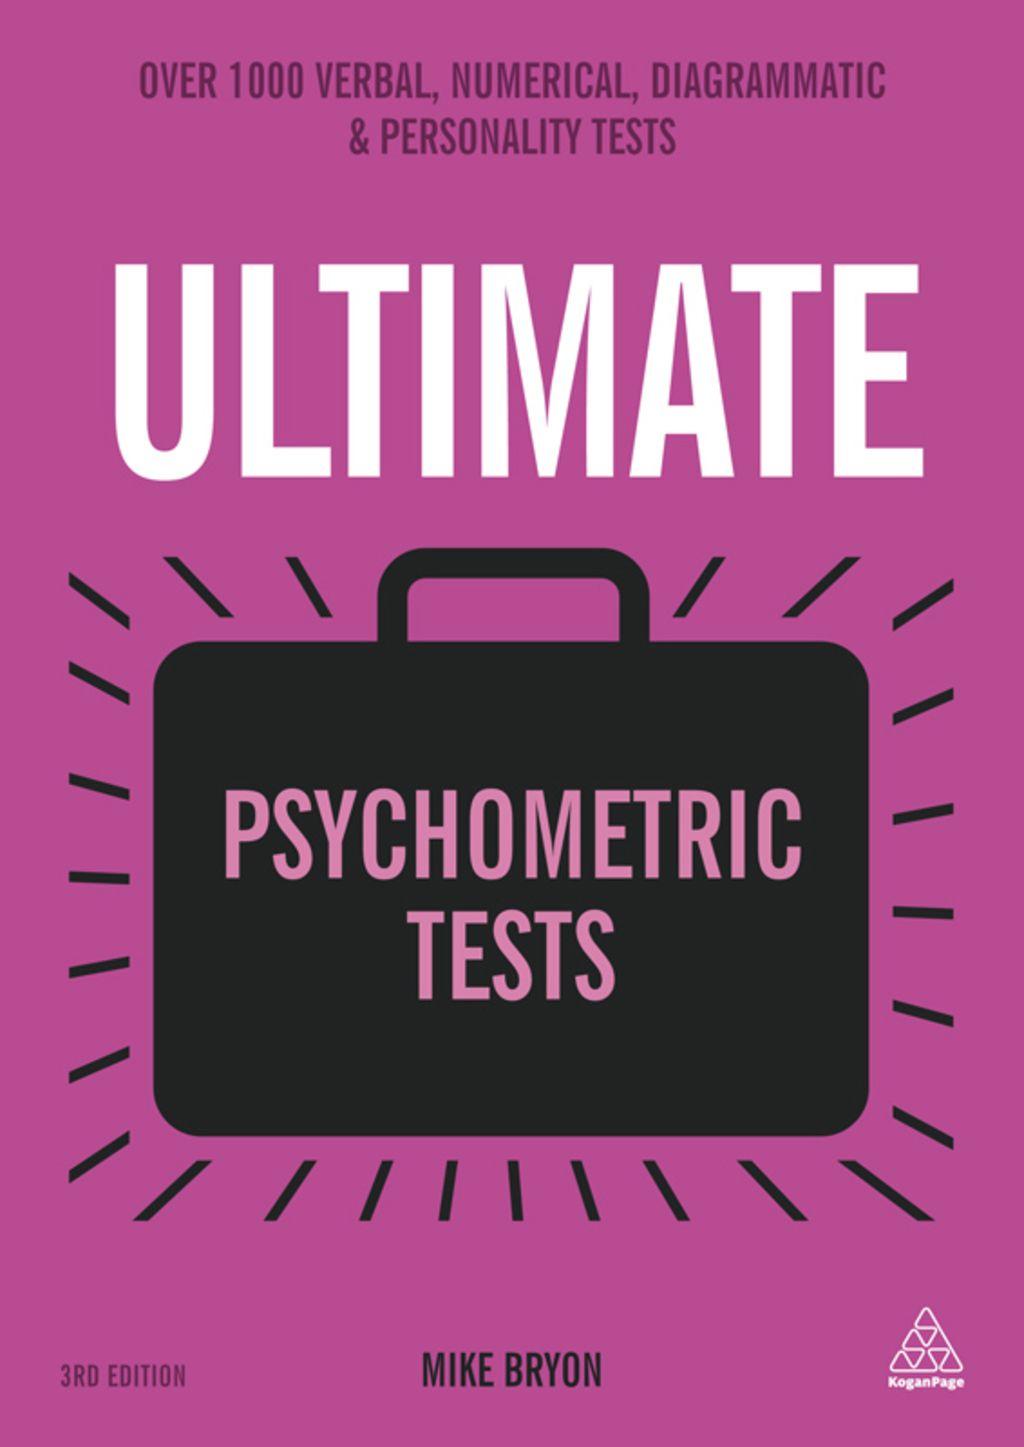 Ultimate Psychometric Tests  Ebook  In 2019